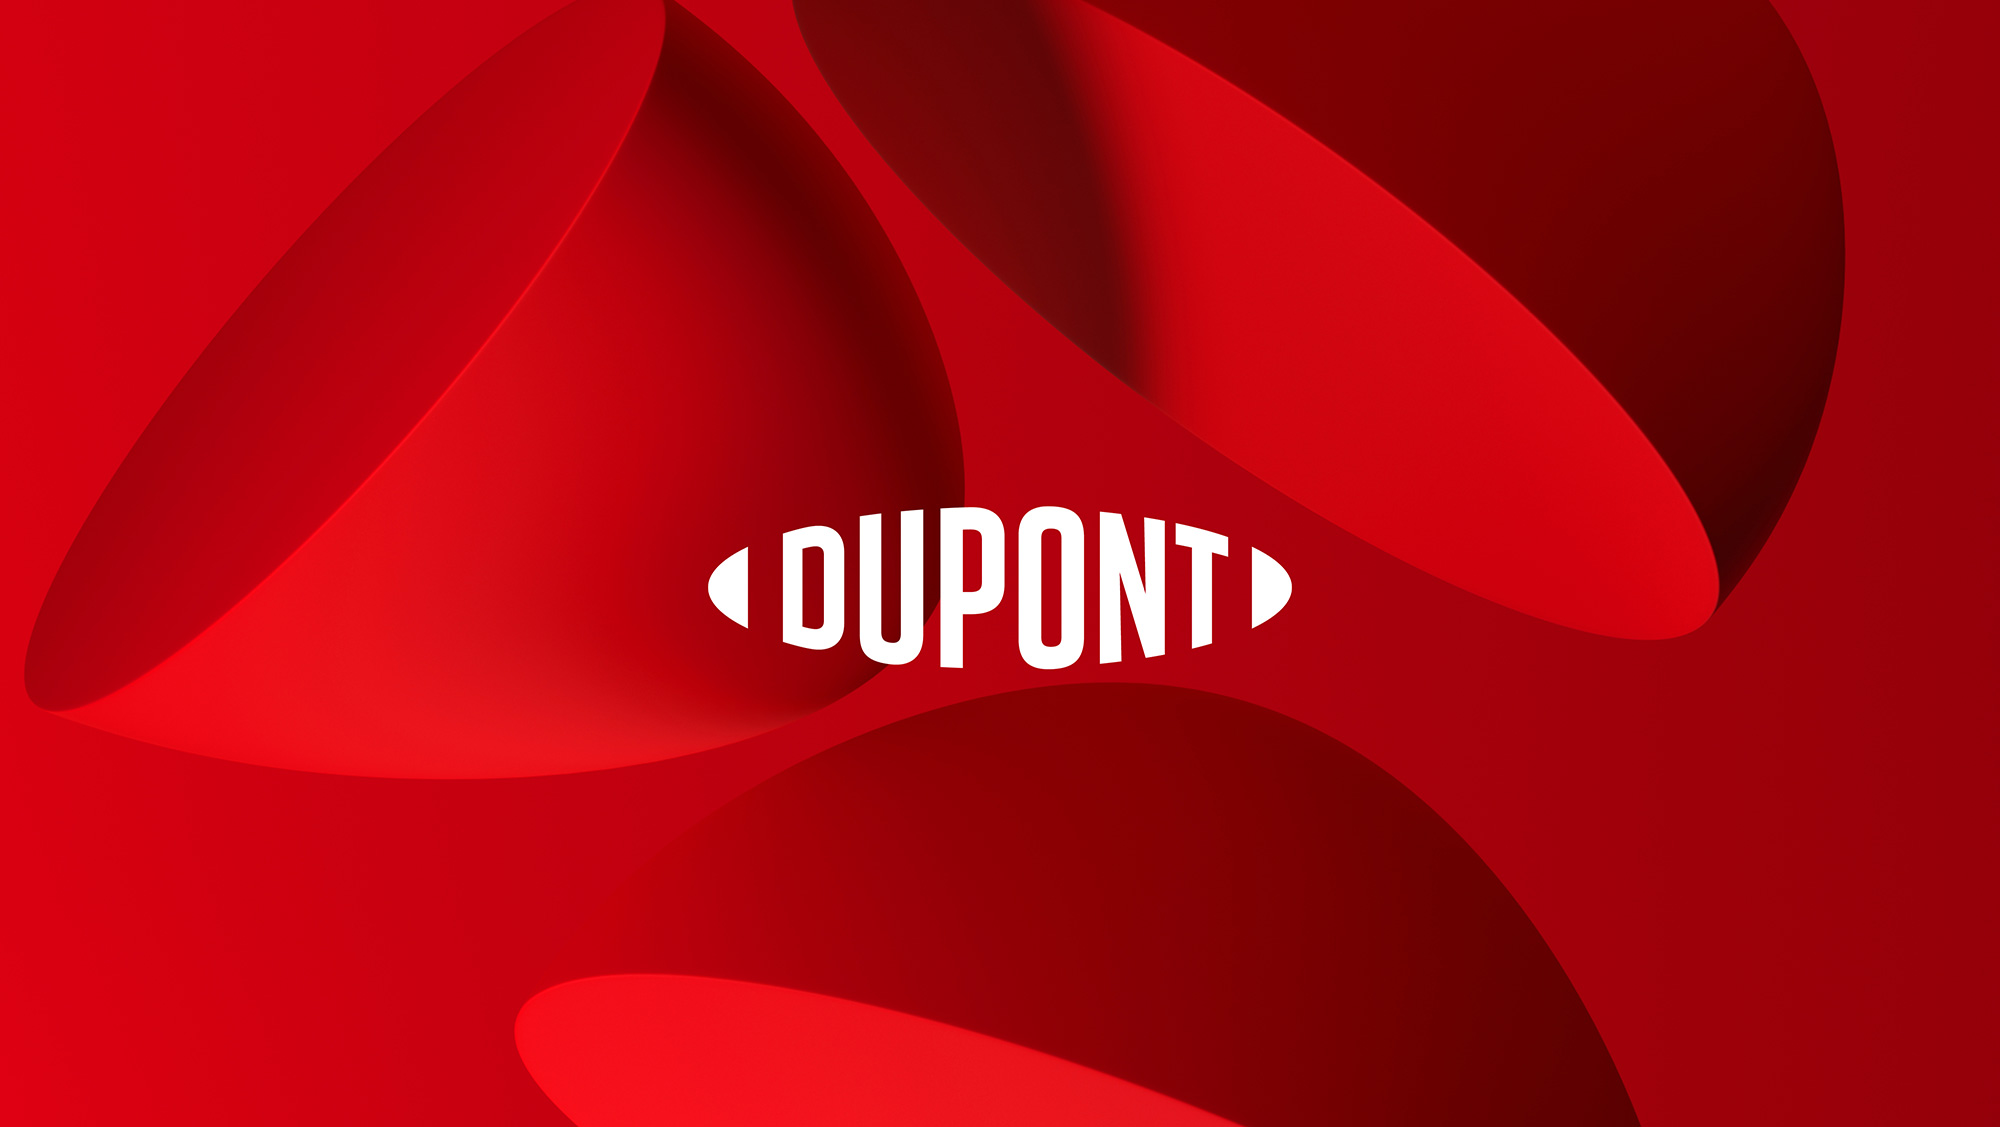 Dupont News